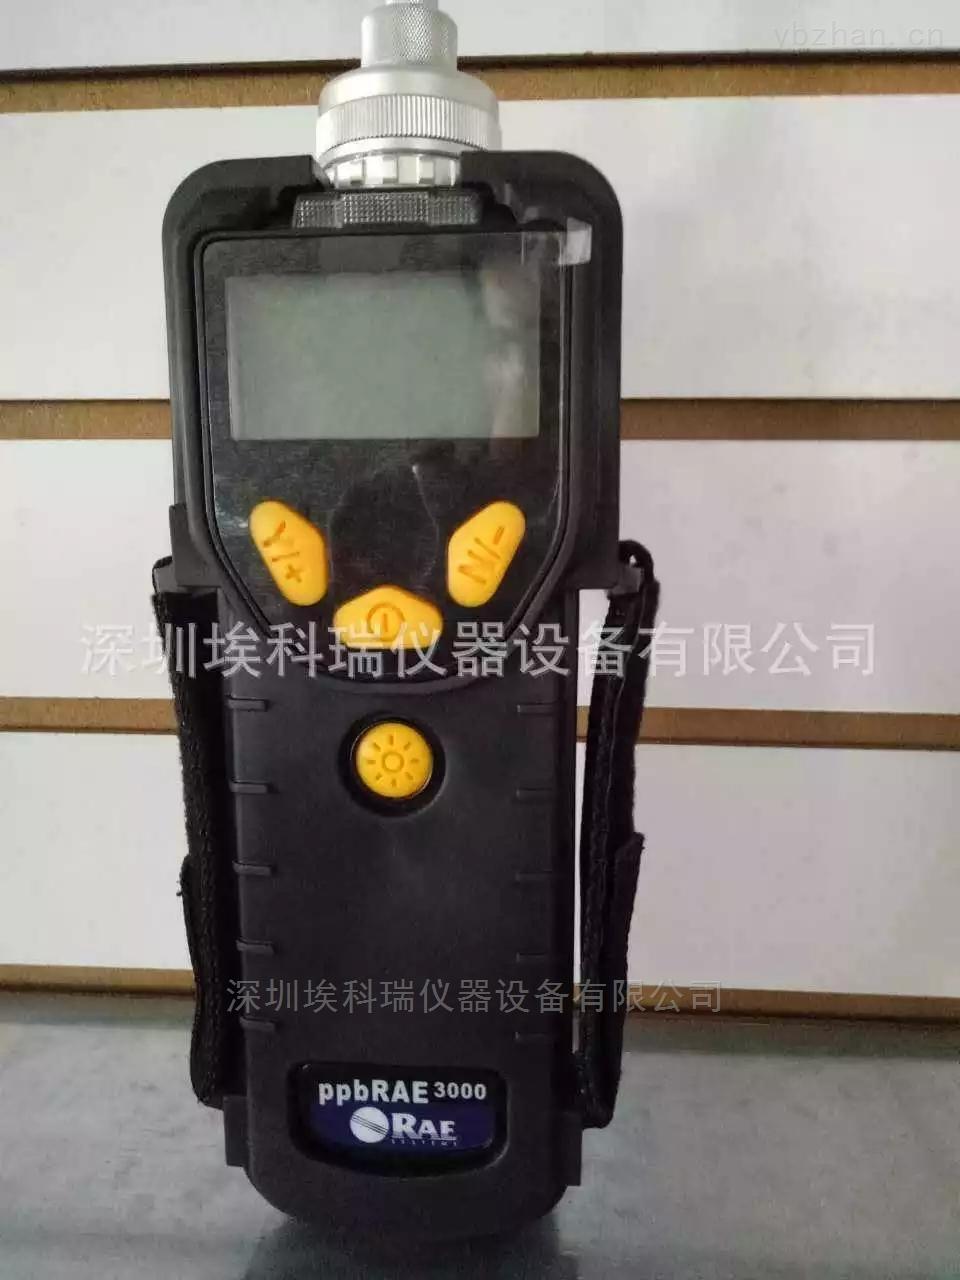 PGM-7340-美國華瑞泵吸式voc氣體檢測儀